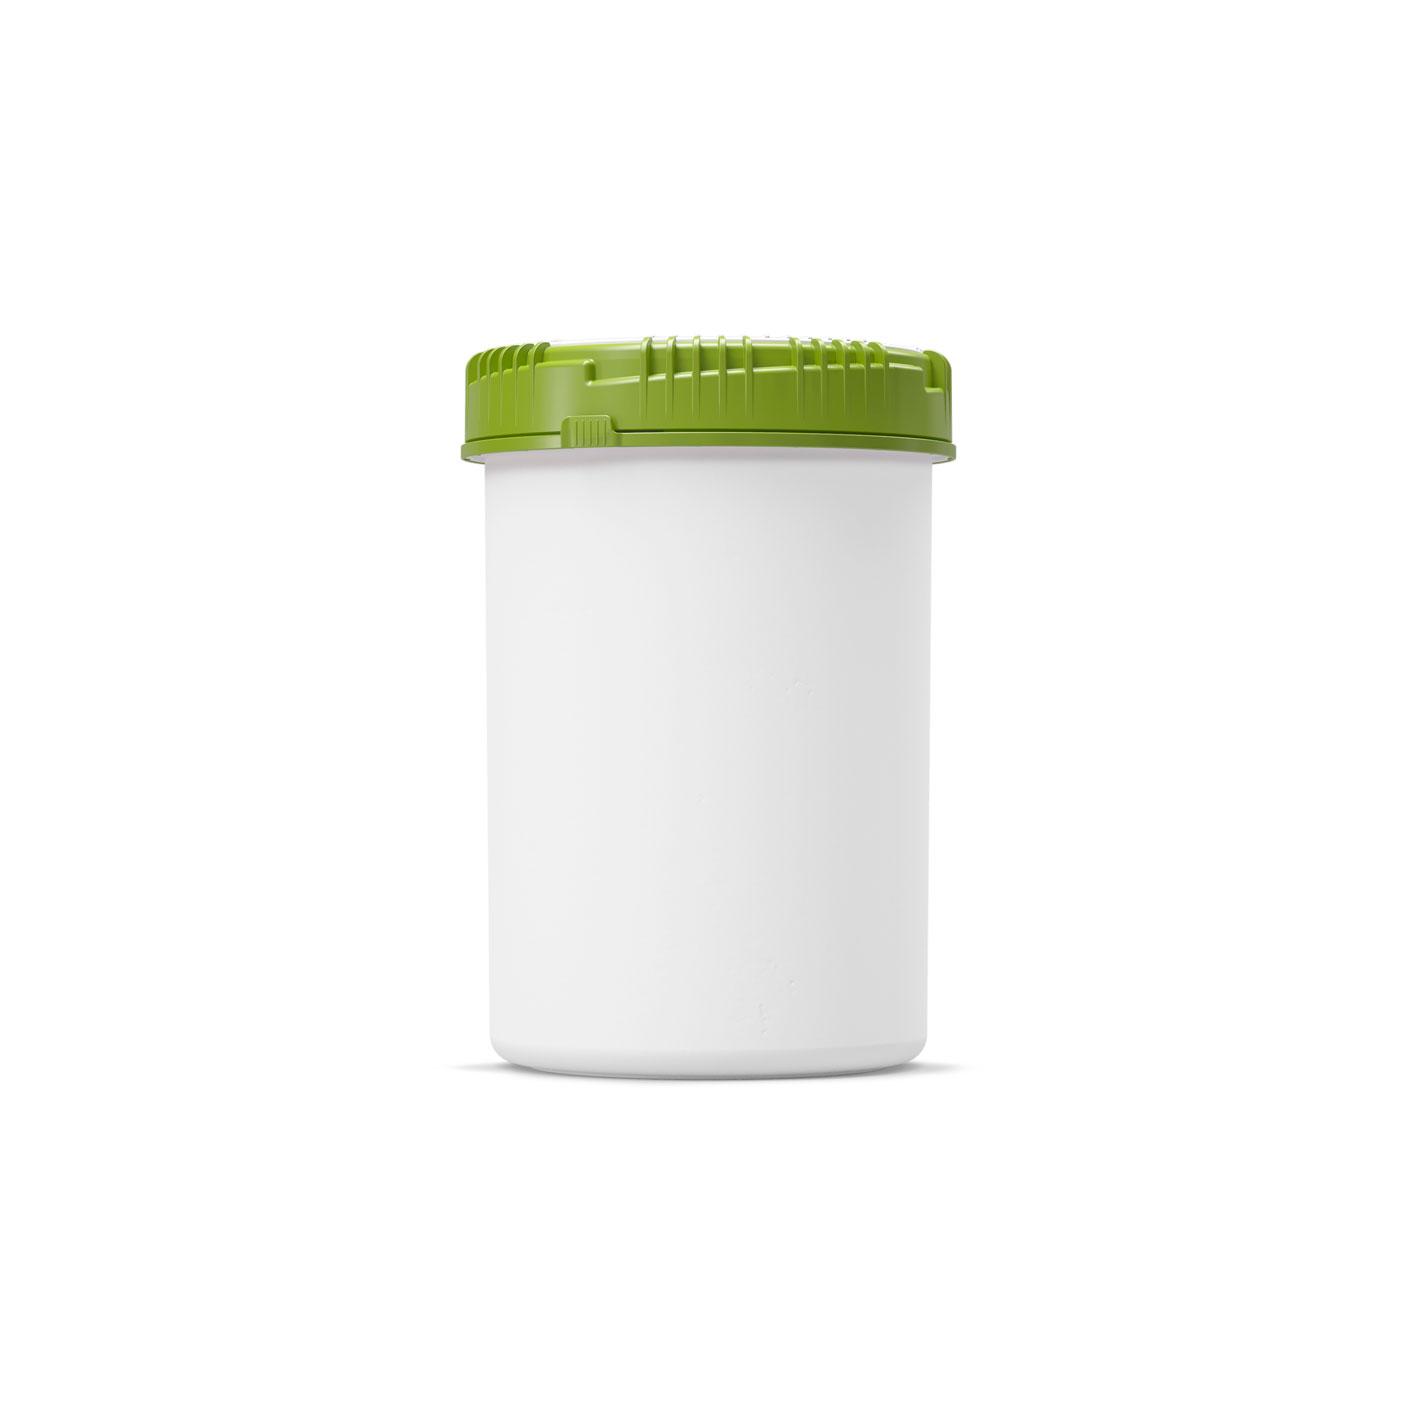 1000 ml Biobased Packo - 7